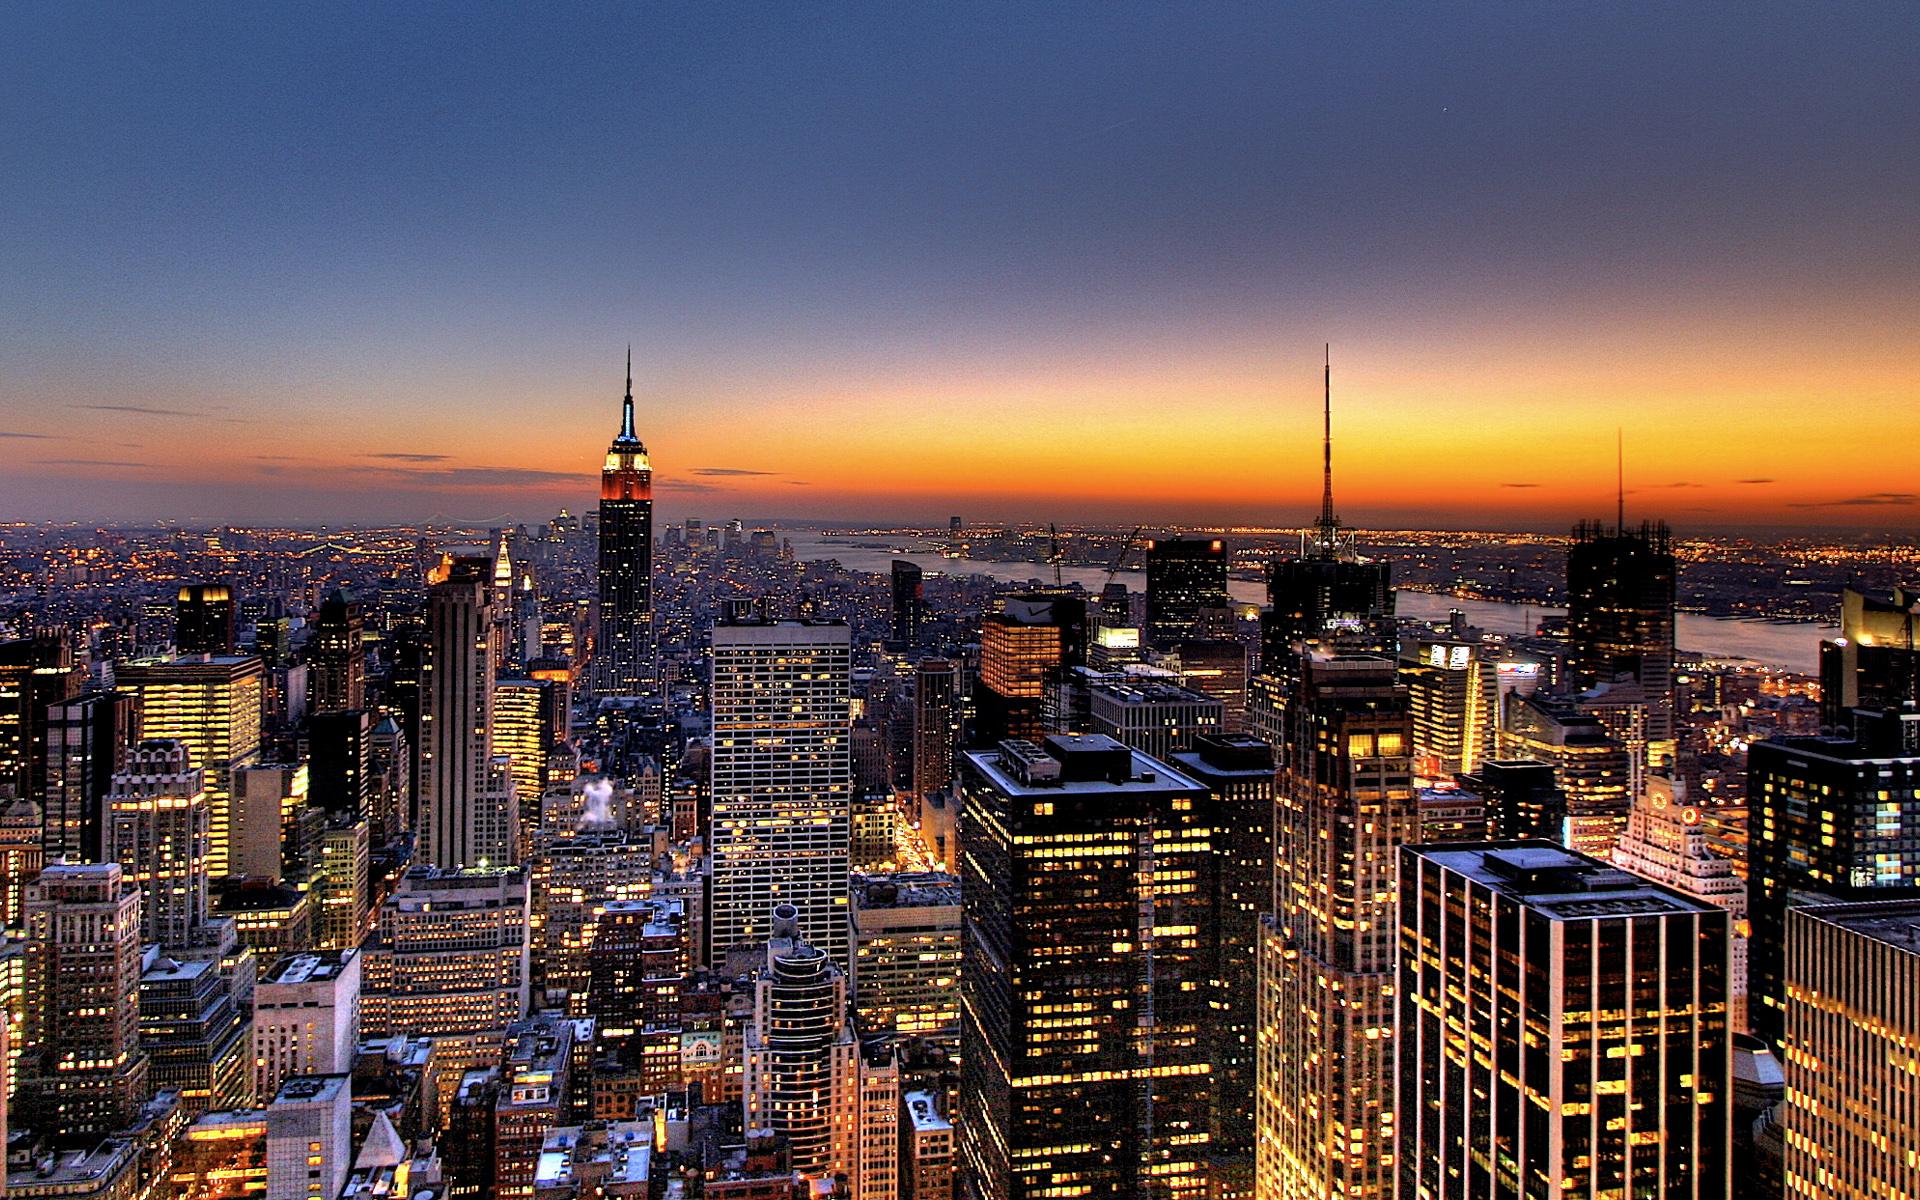 New York Skyline Wallpapers | HD Wallpapers